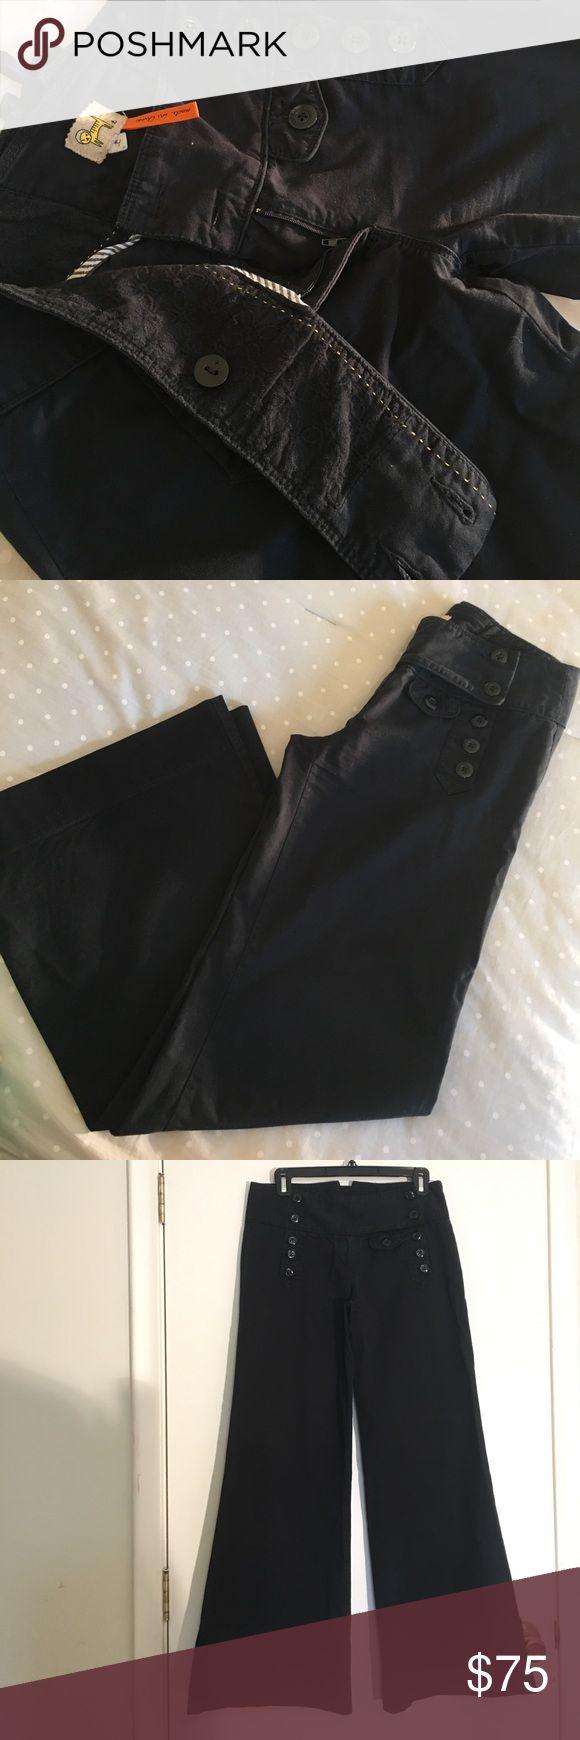 Black Sailor Button Detail Wide-Leg Pant NWOT Black bell-bottom wide leg flare lightweight cotton mix pants with sailor button details and lace-up waistband on back.  98% cotton 2% spandex Pants